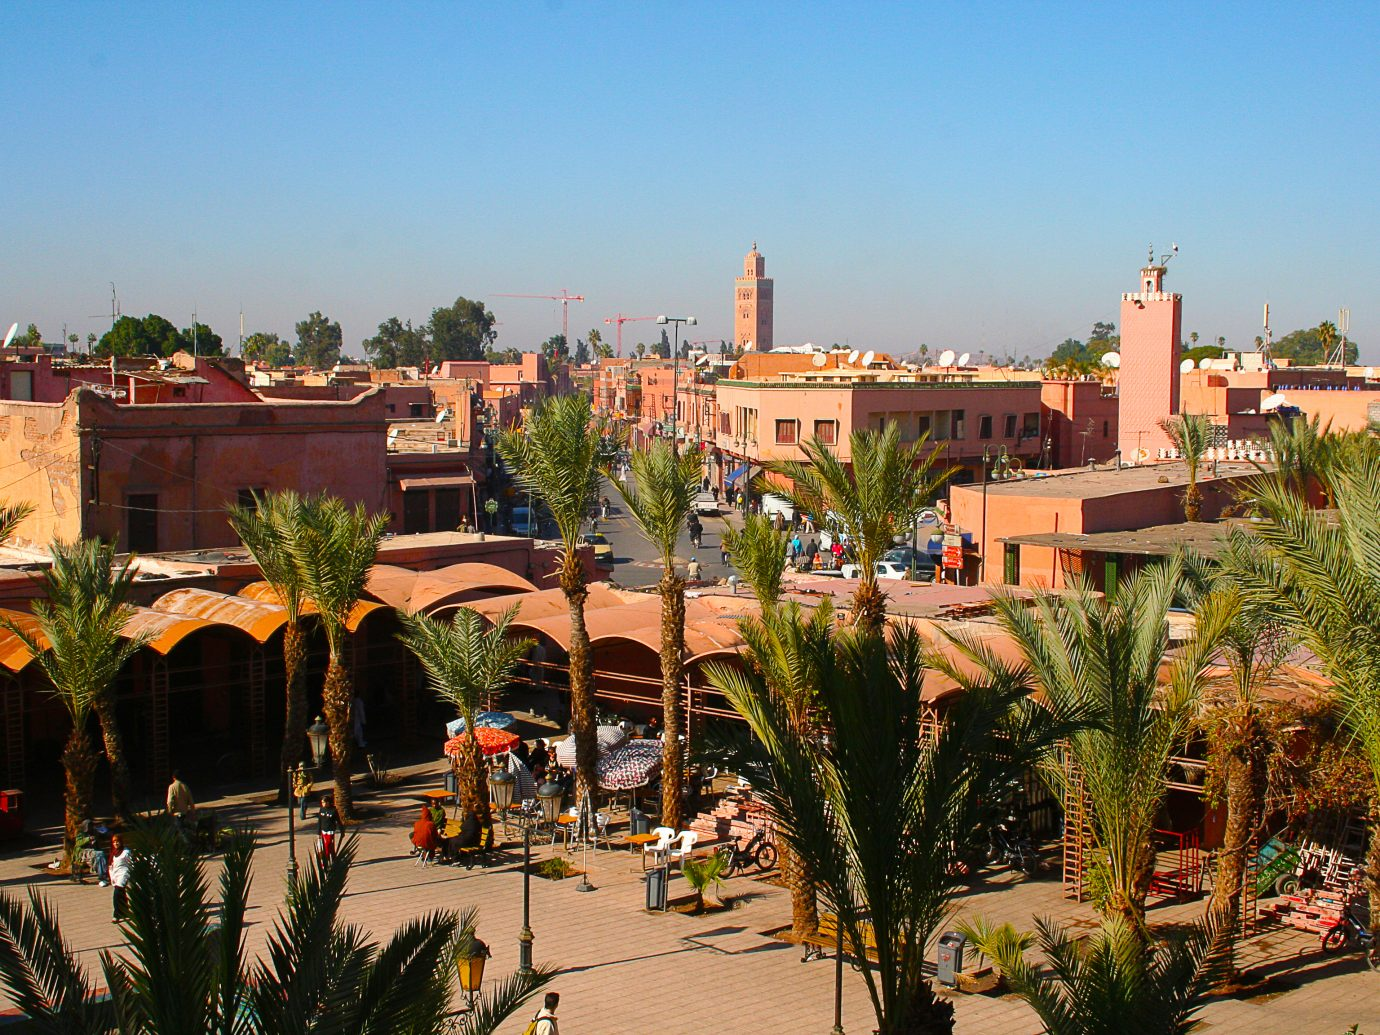 Marrakesh's Medina quarter in Morocco, Northern Africa